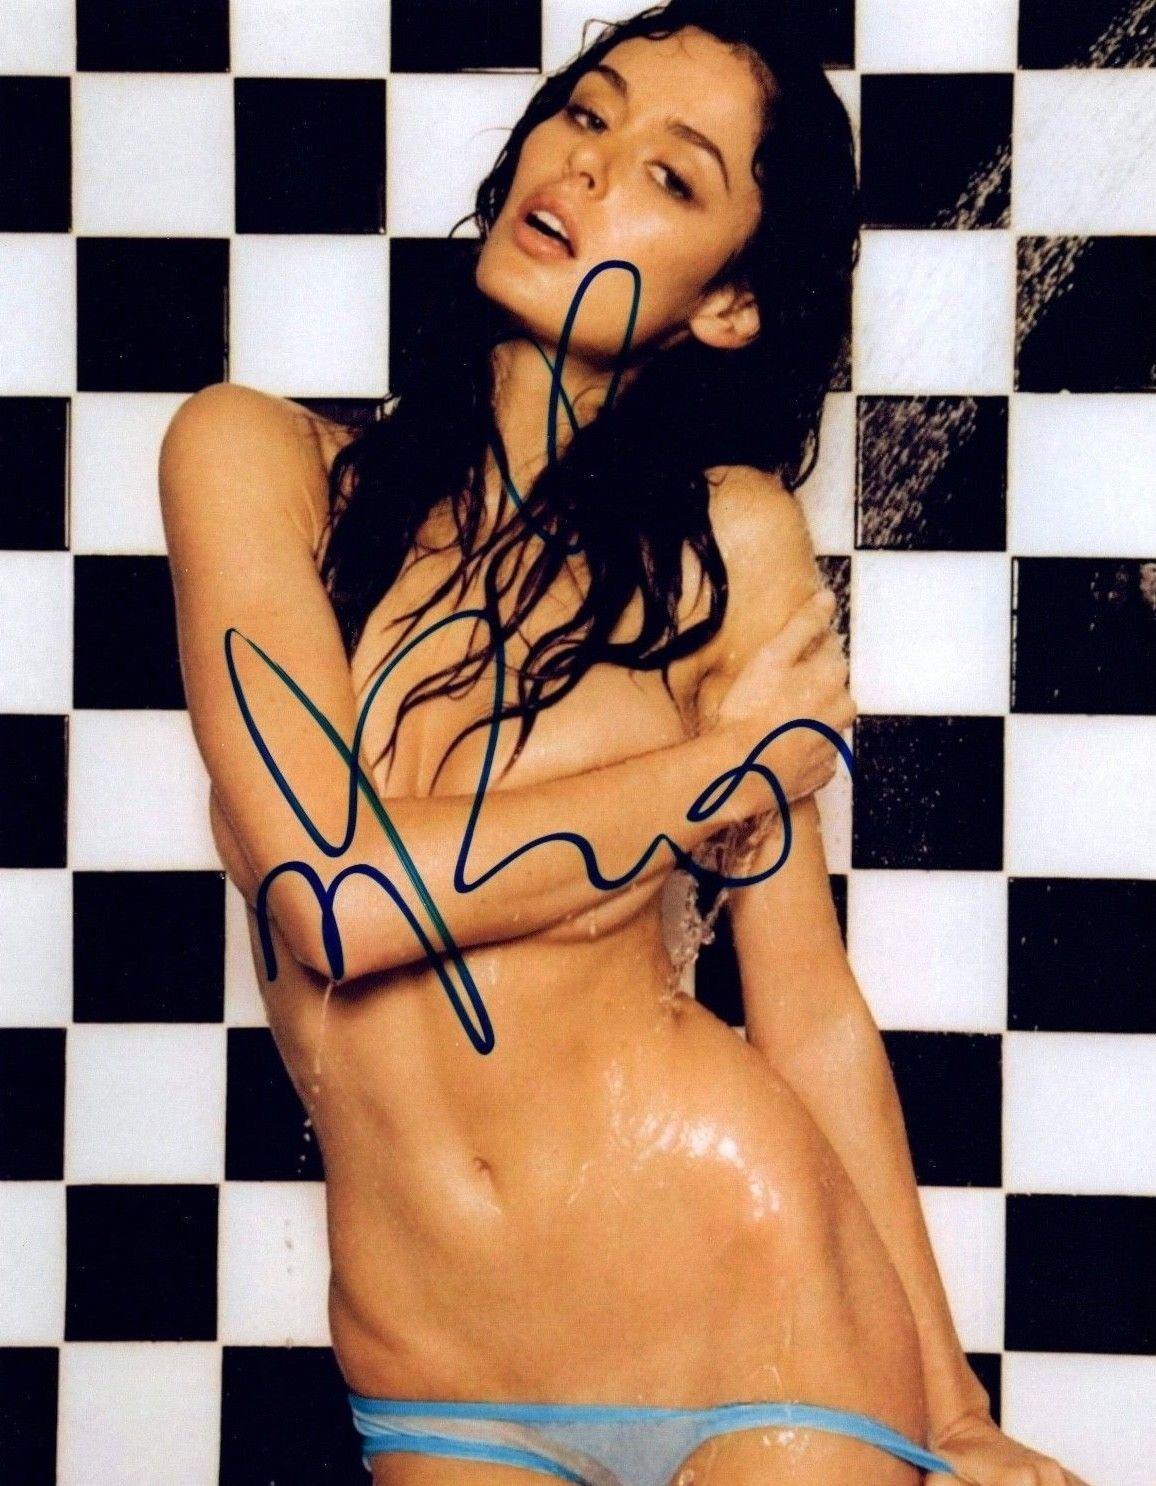 Ashley Greene's Bikini Scene FromStaten Island Summer',Alli simpson XXX fotos CelebGate Kim Kardashian Nude Sexy - 9 Photos,Bella Thorne in Sexy Lingerie, December